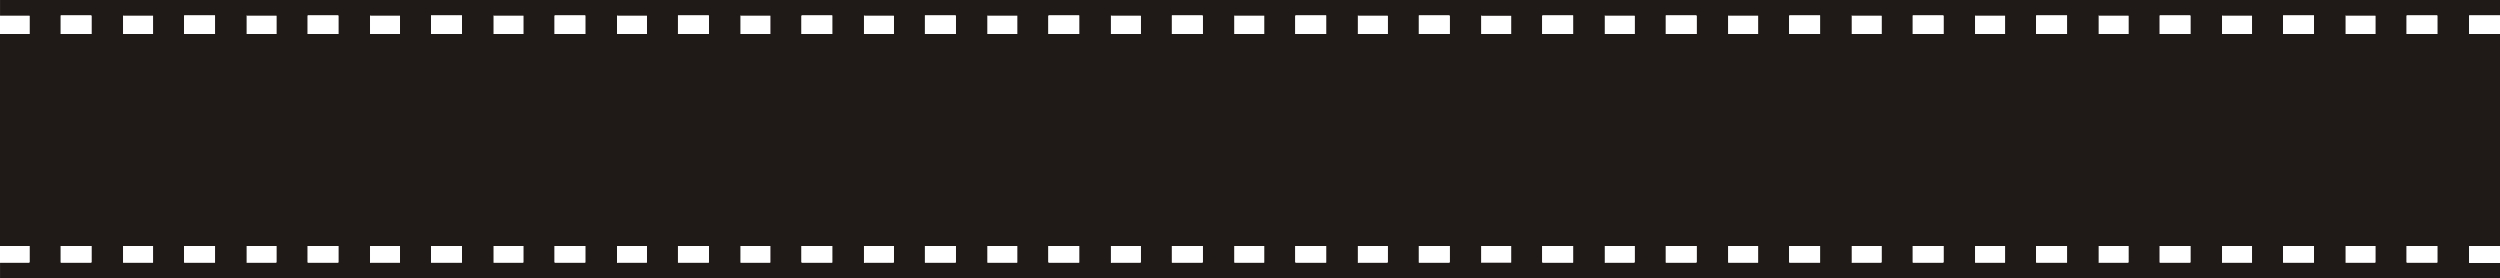 rola film.png